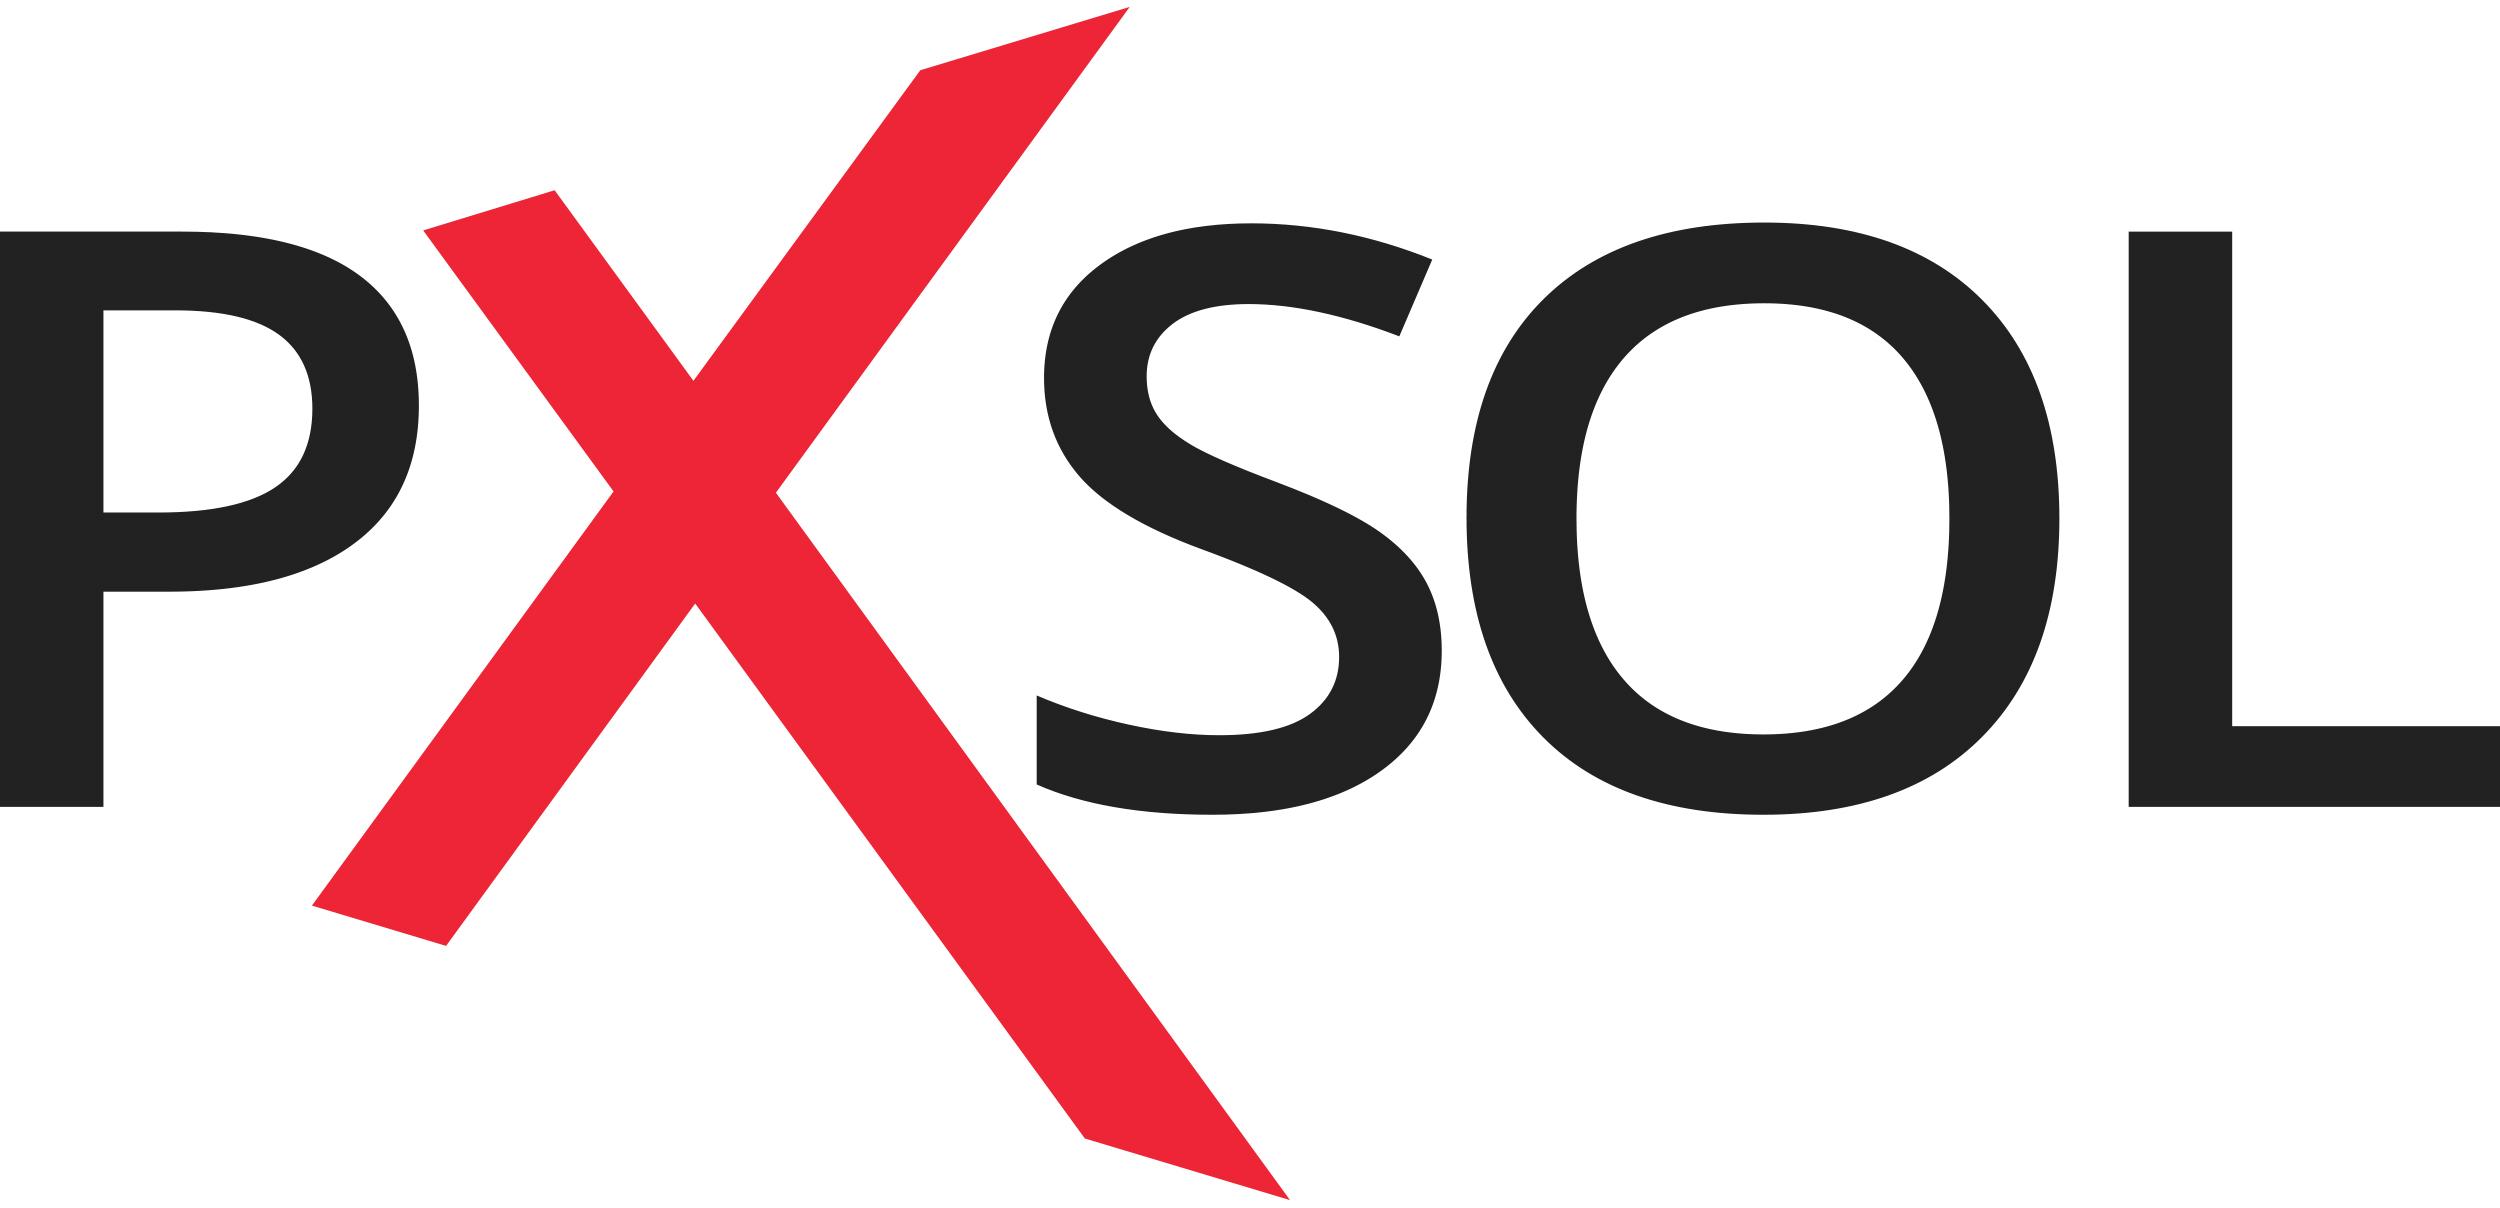 Logotipo pxsol